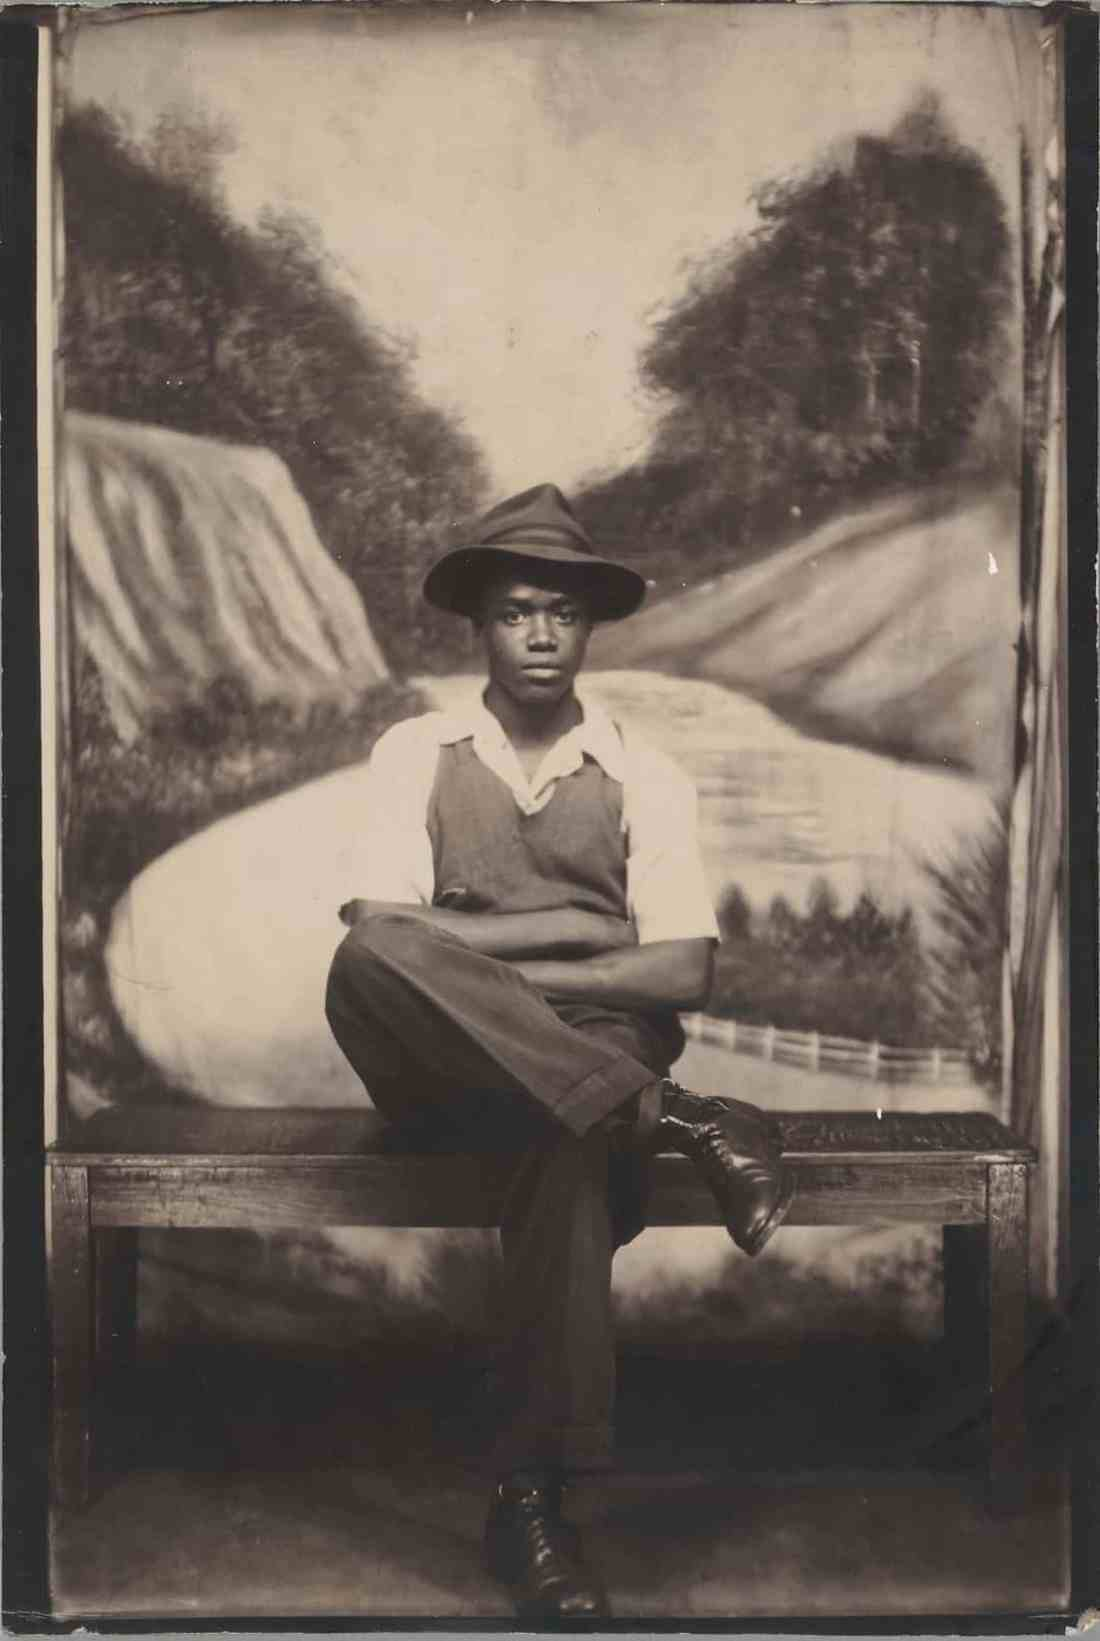 African American Portraits: Photographs from the 1940s and 1950s, Metropolitan Museum of Art, African American History, Black History, African American Communities, Black Communities, African American Photography, KOLUMN Magazine, KOLUMN, KINDR'D Magazine, KINDR'D